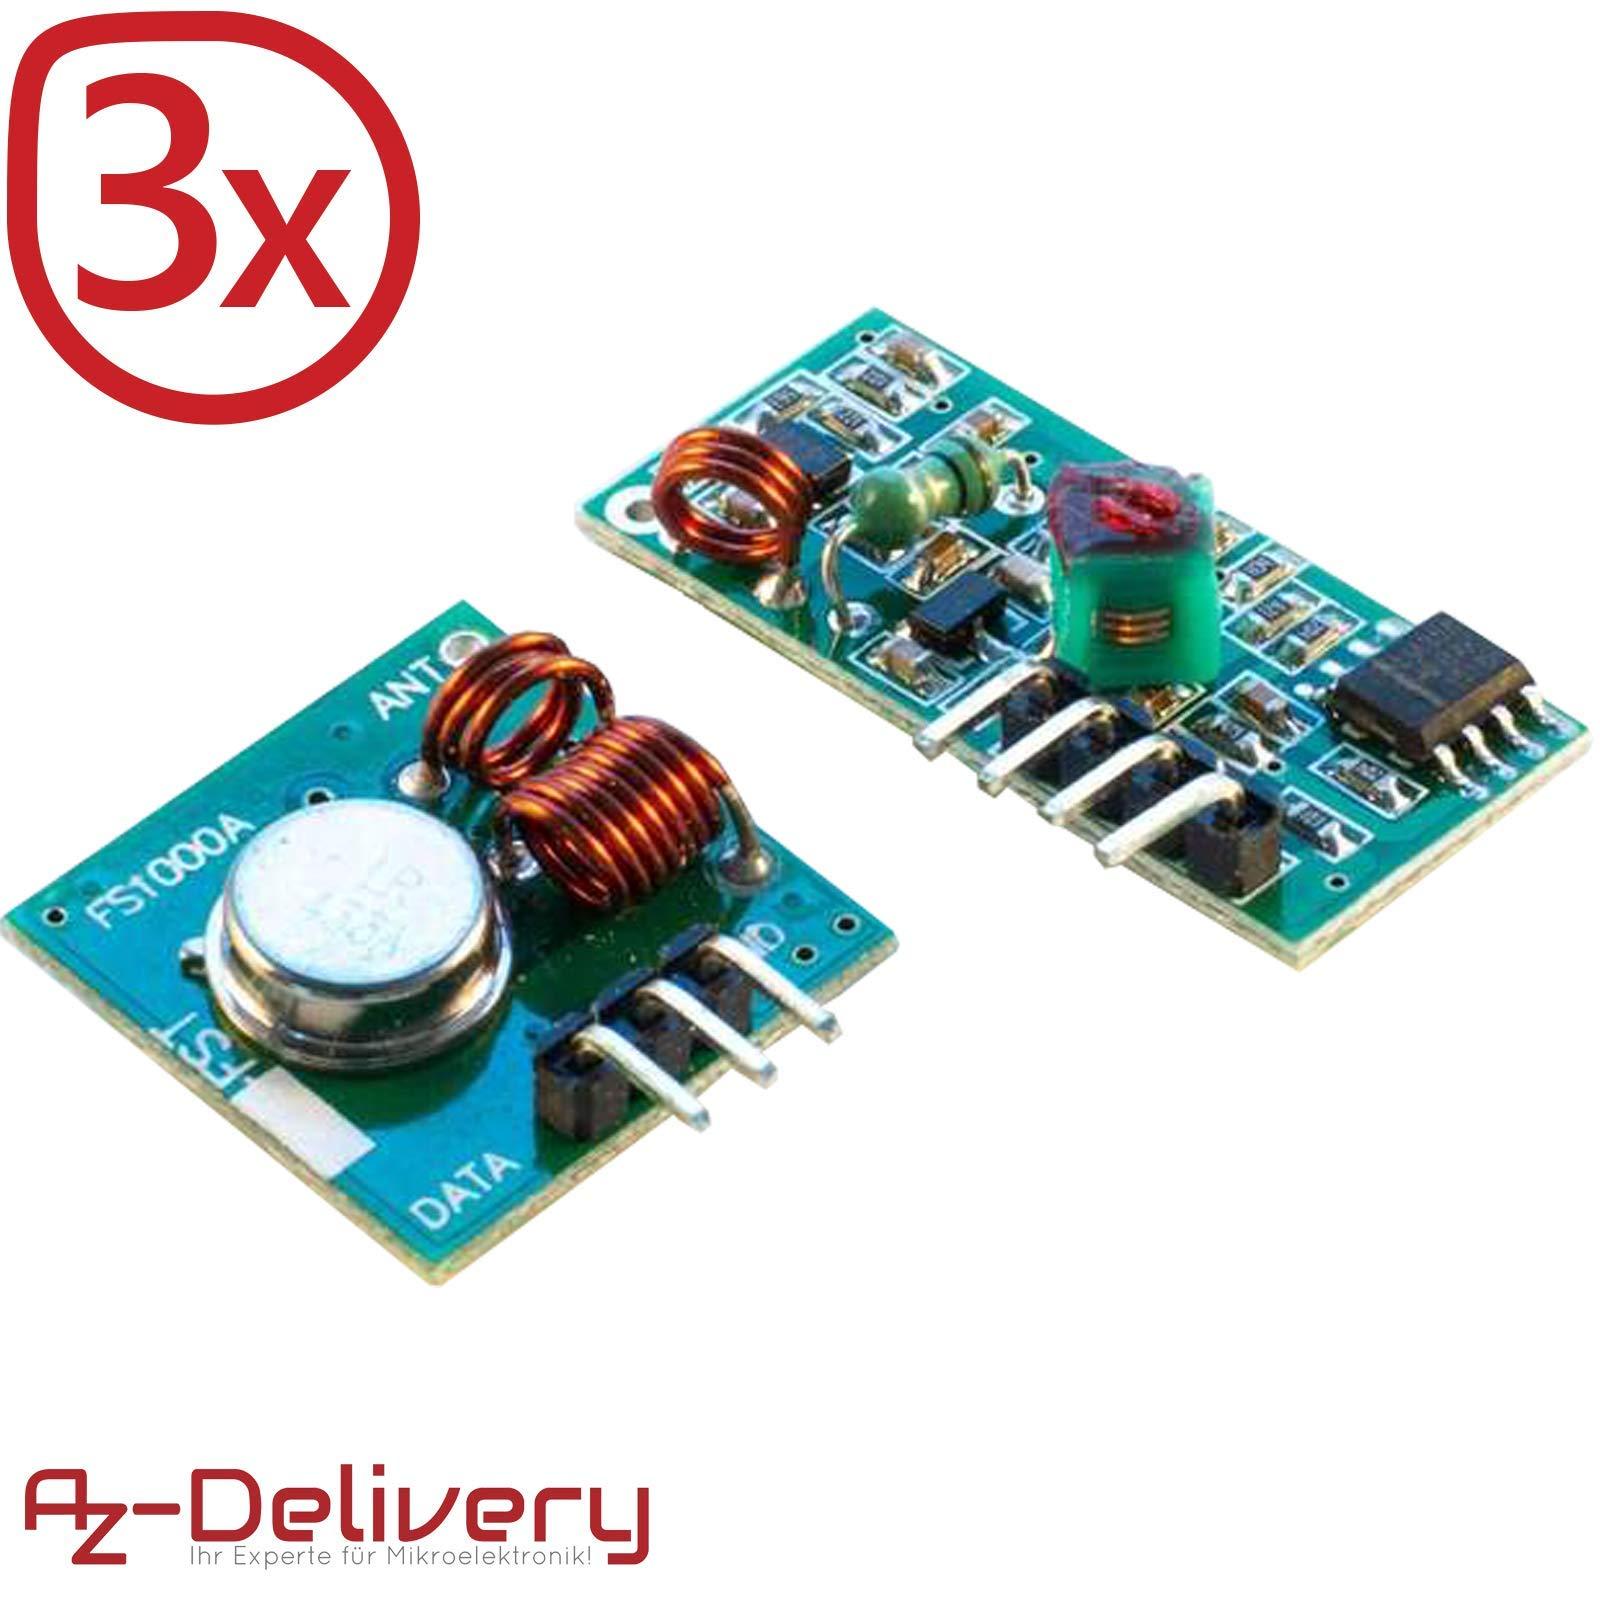 WINGONEER RXB6 433Mhz Superheterodyne Wireless Receiver